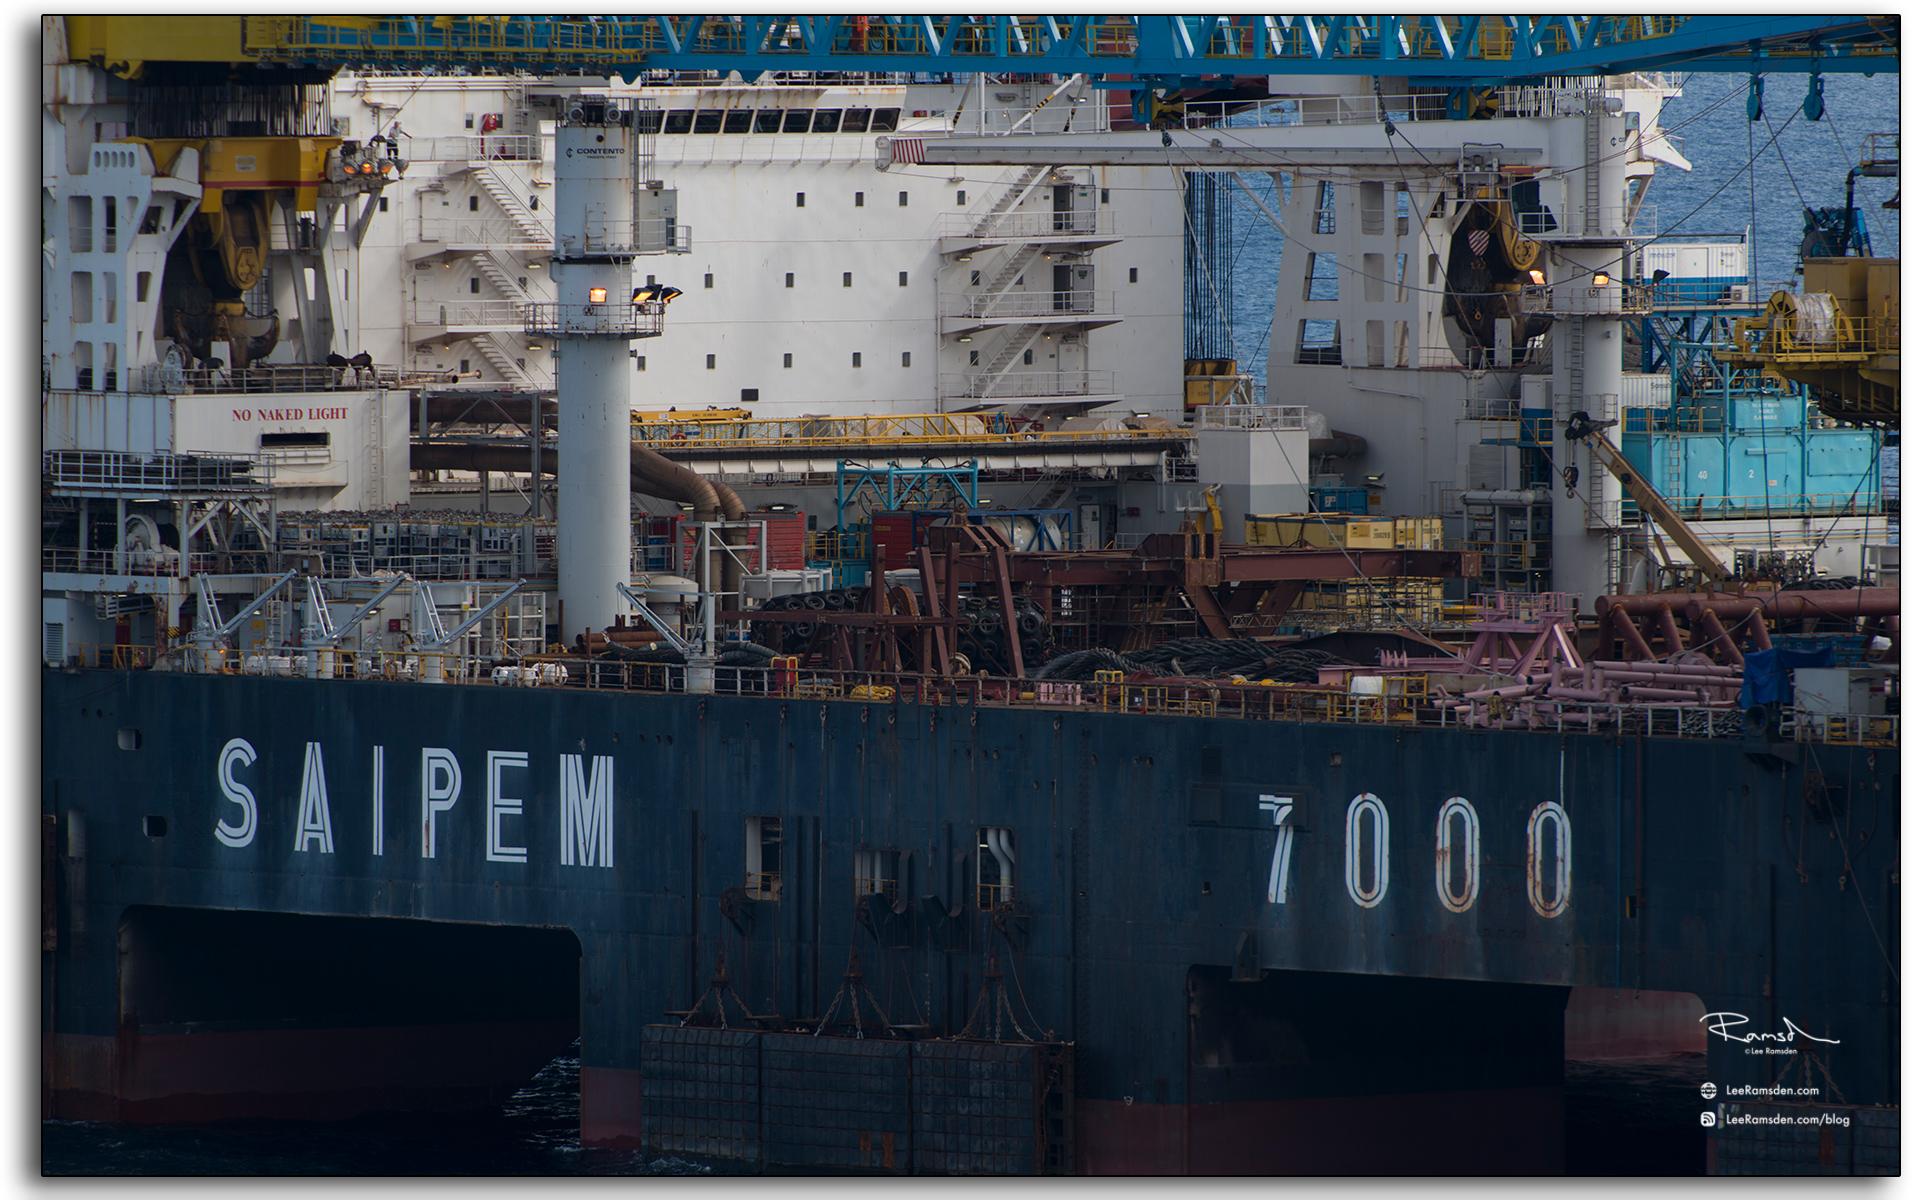 Saipem 7000, heavy lifting, vessel